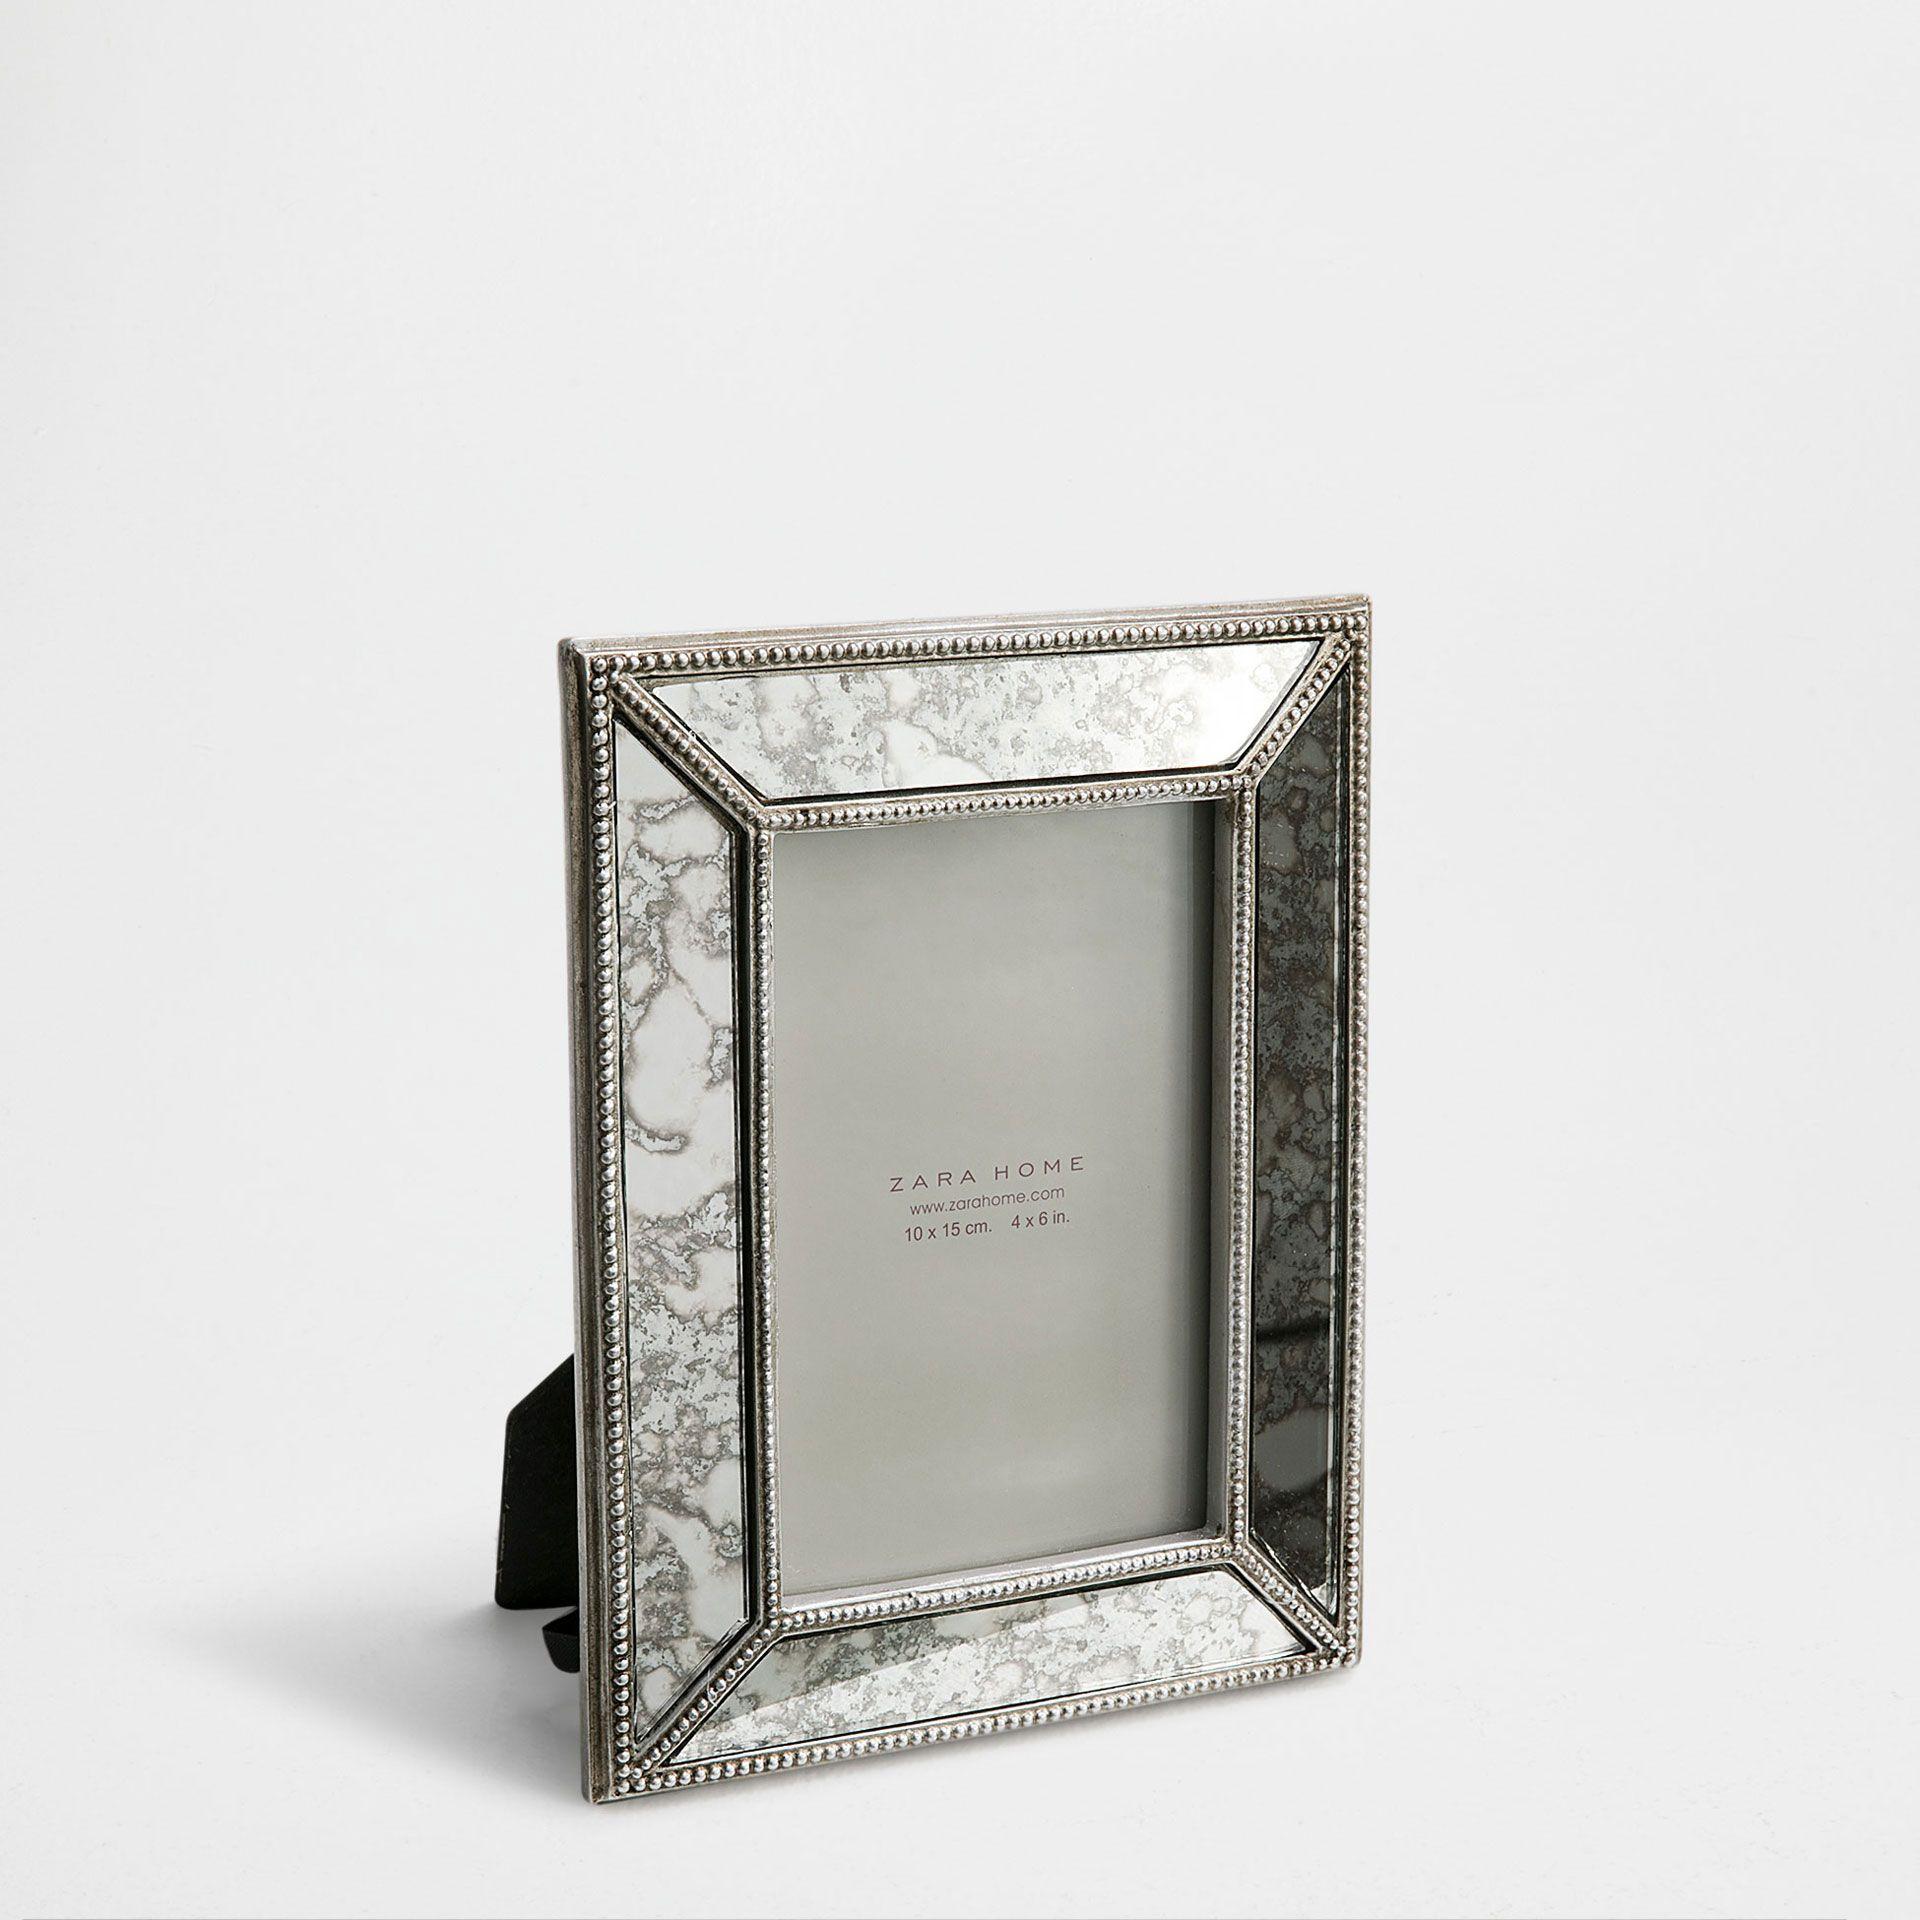 Mirrored Antique Finish Frame  Frames  Decoration - Zara Home